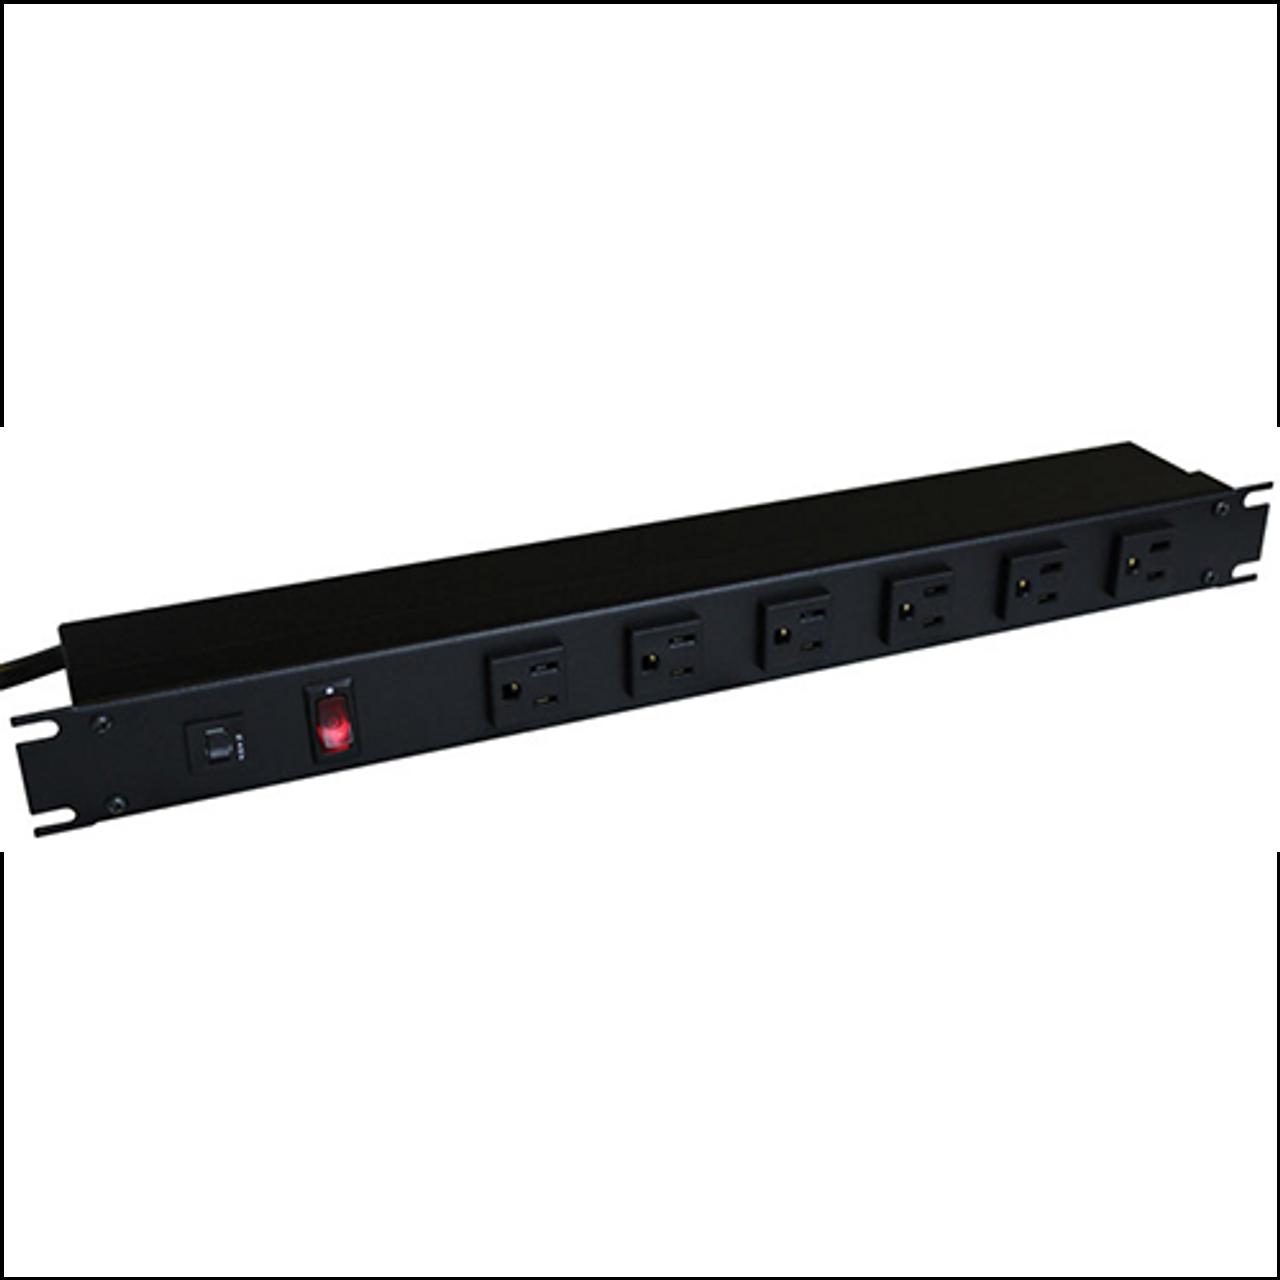 Rack mount 30 amp power strip